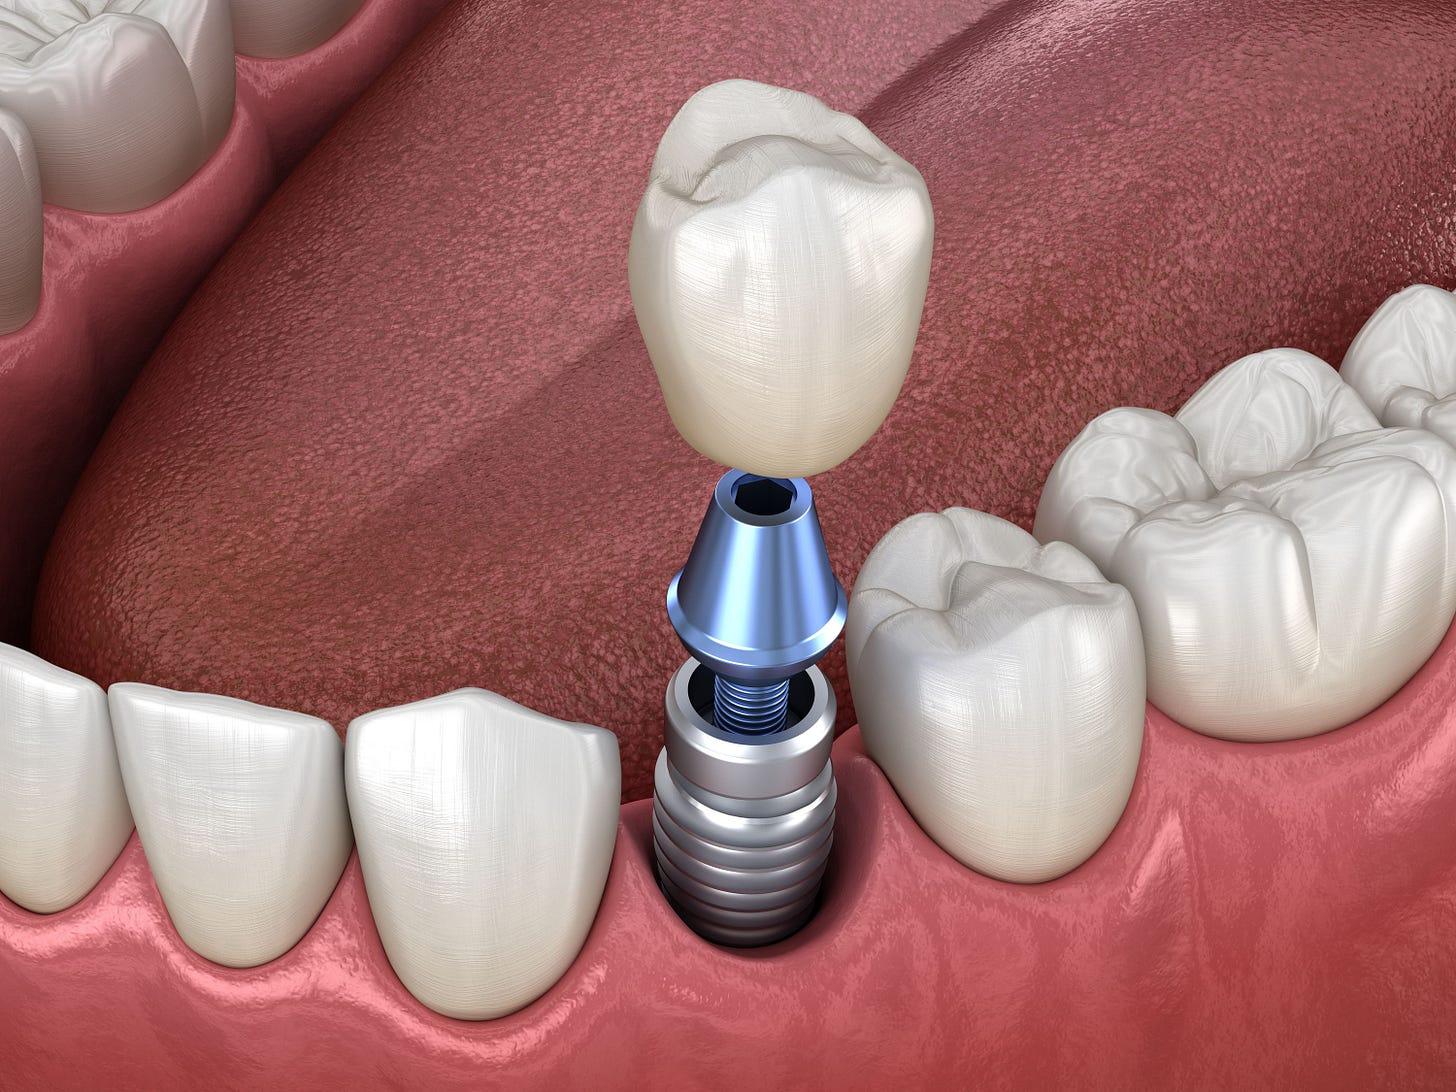 Dental Implant Surgery Recovery: Lake Jackson, TX